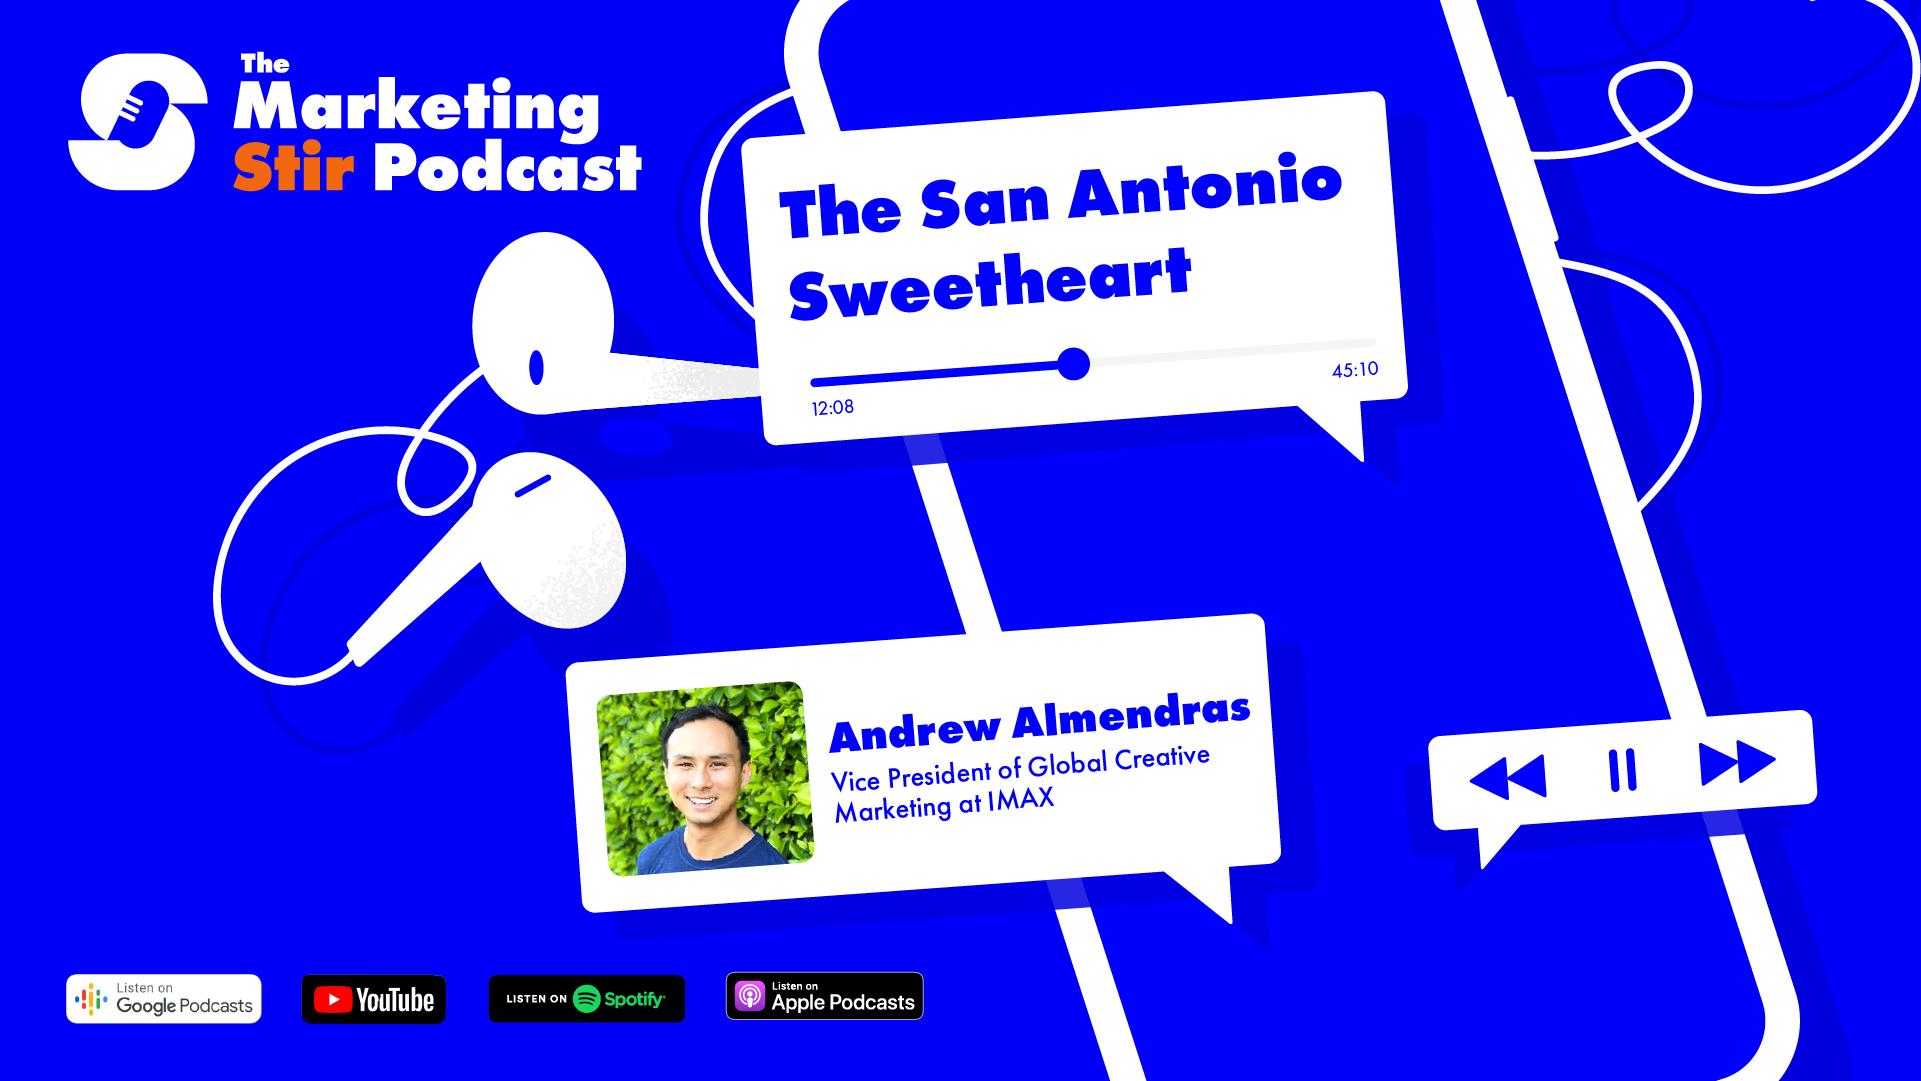 Andrew Almendras (IMAX) - The San Antonio Sweetheart